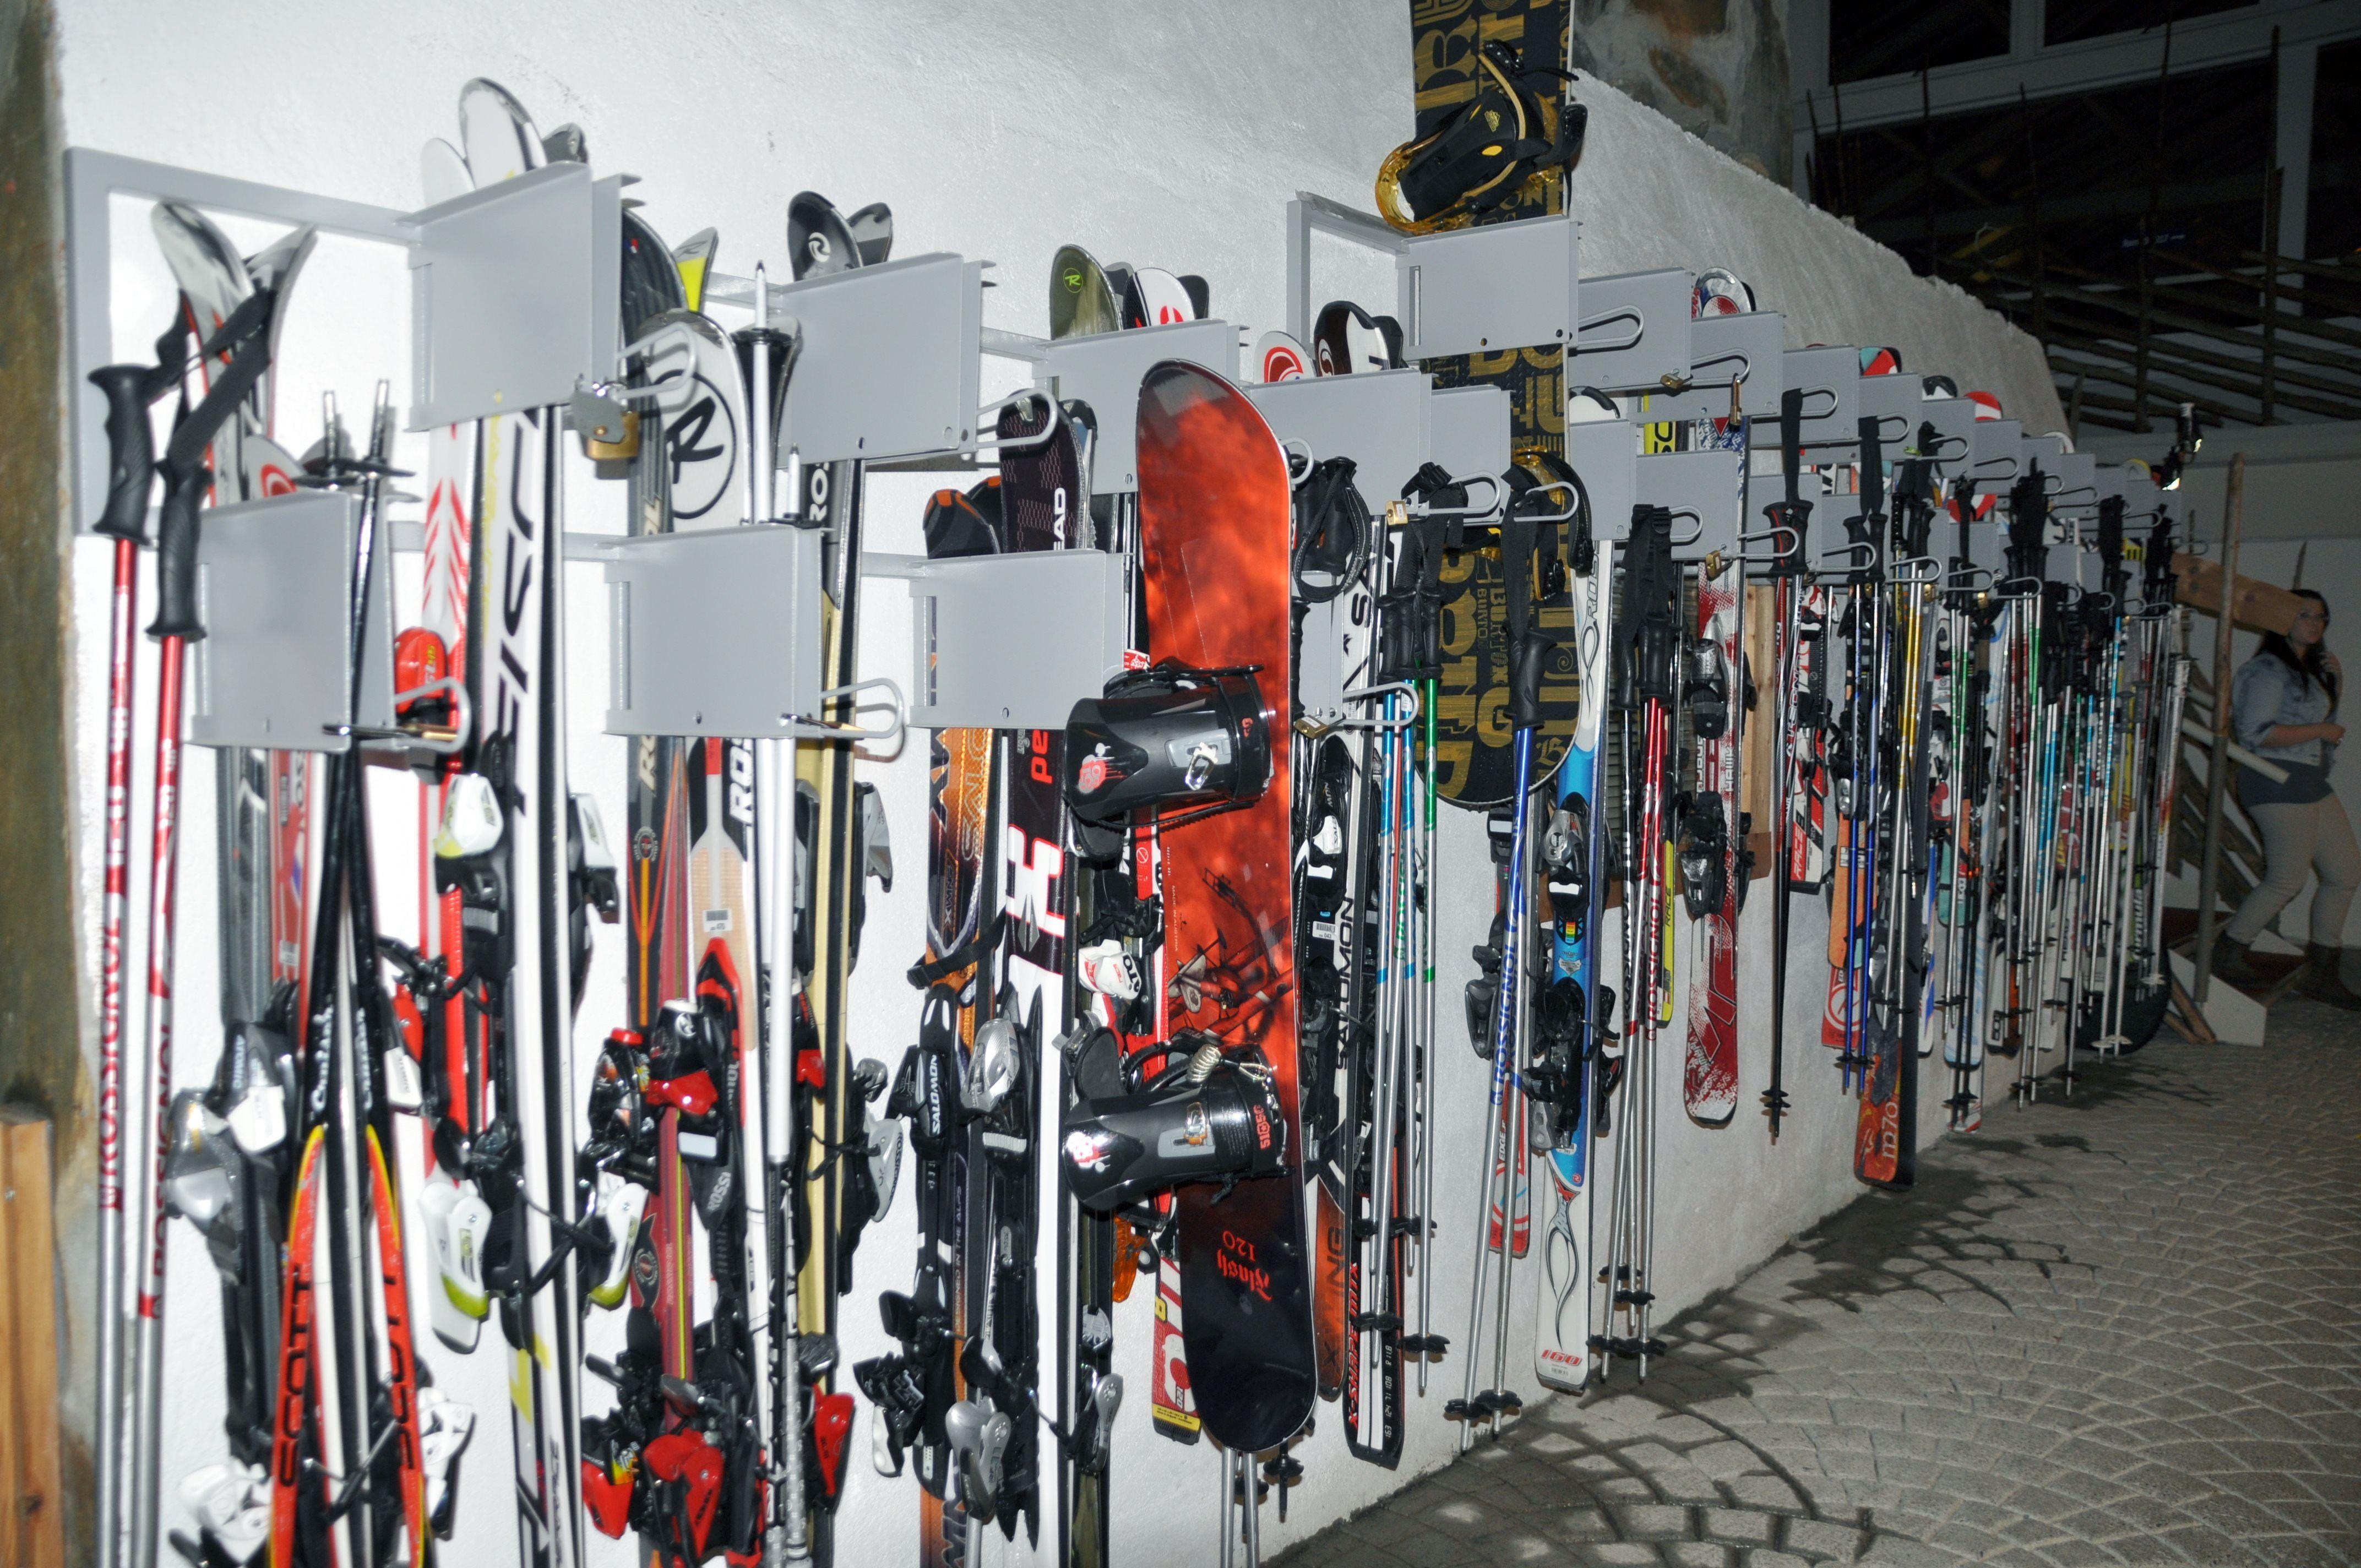 Ski lockers at Hafjell Hotel in Norway